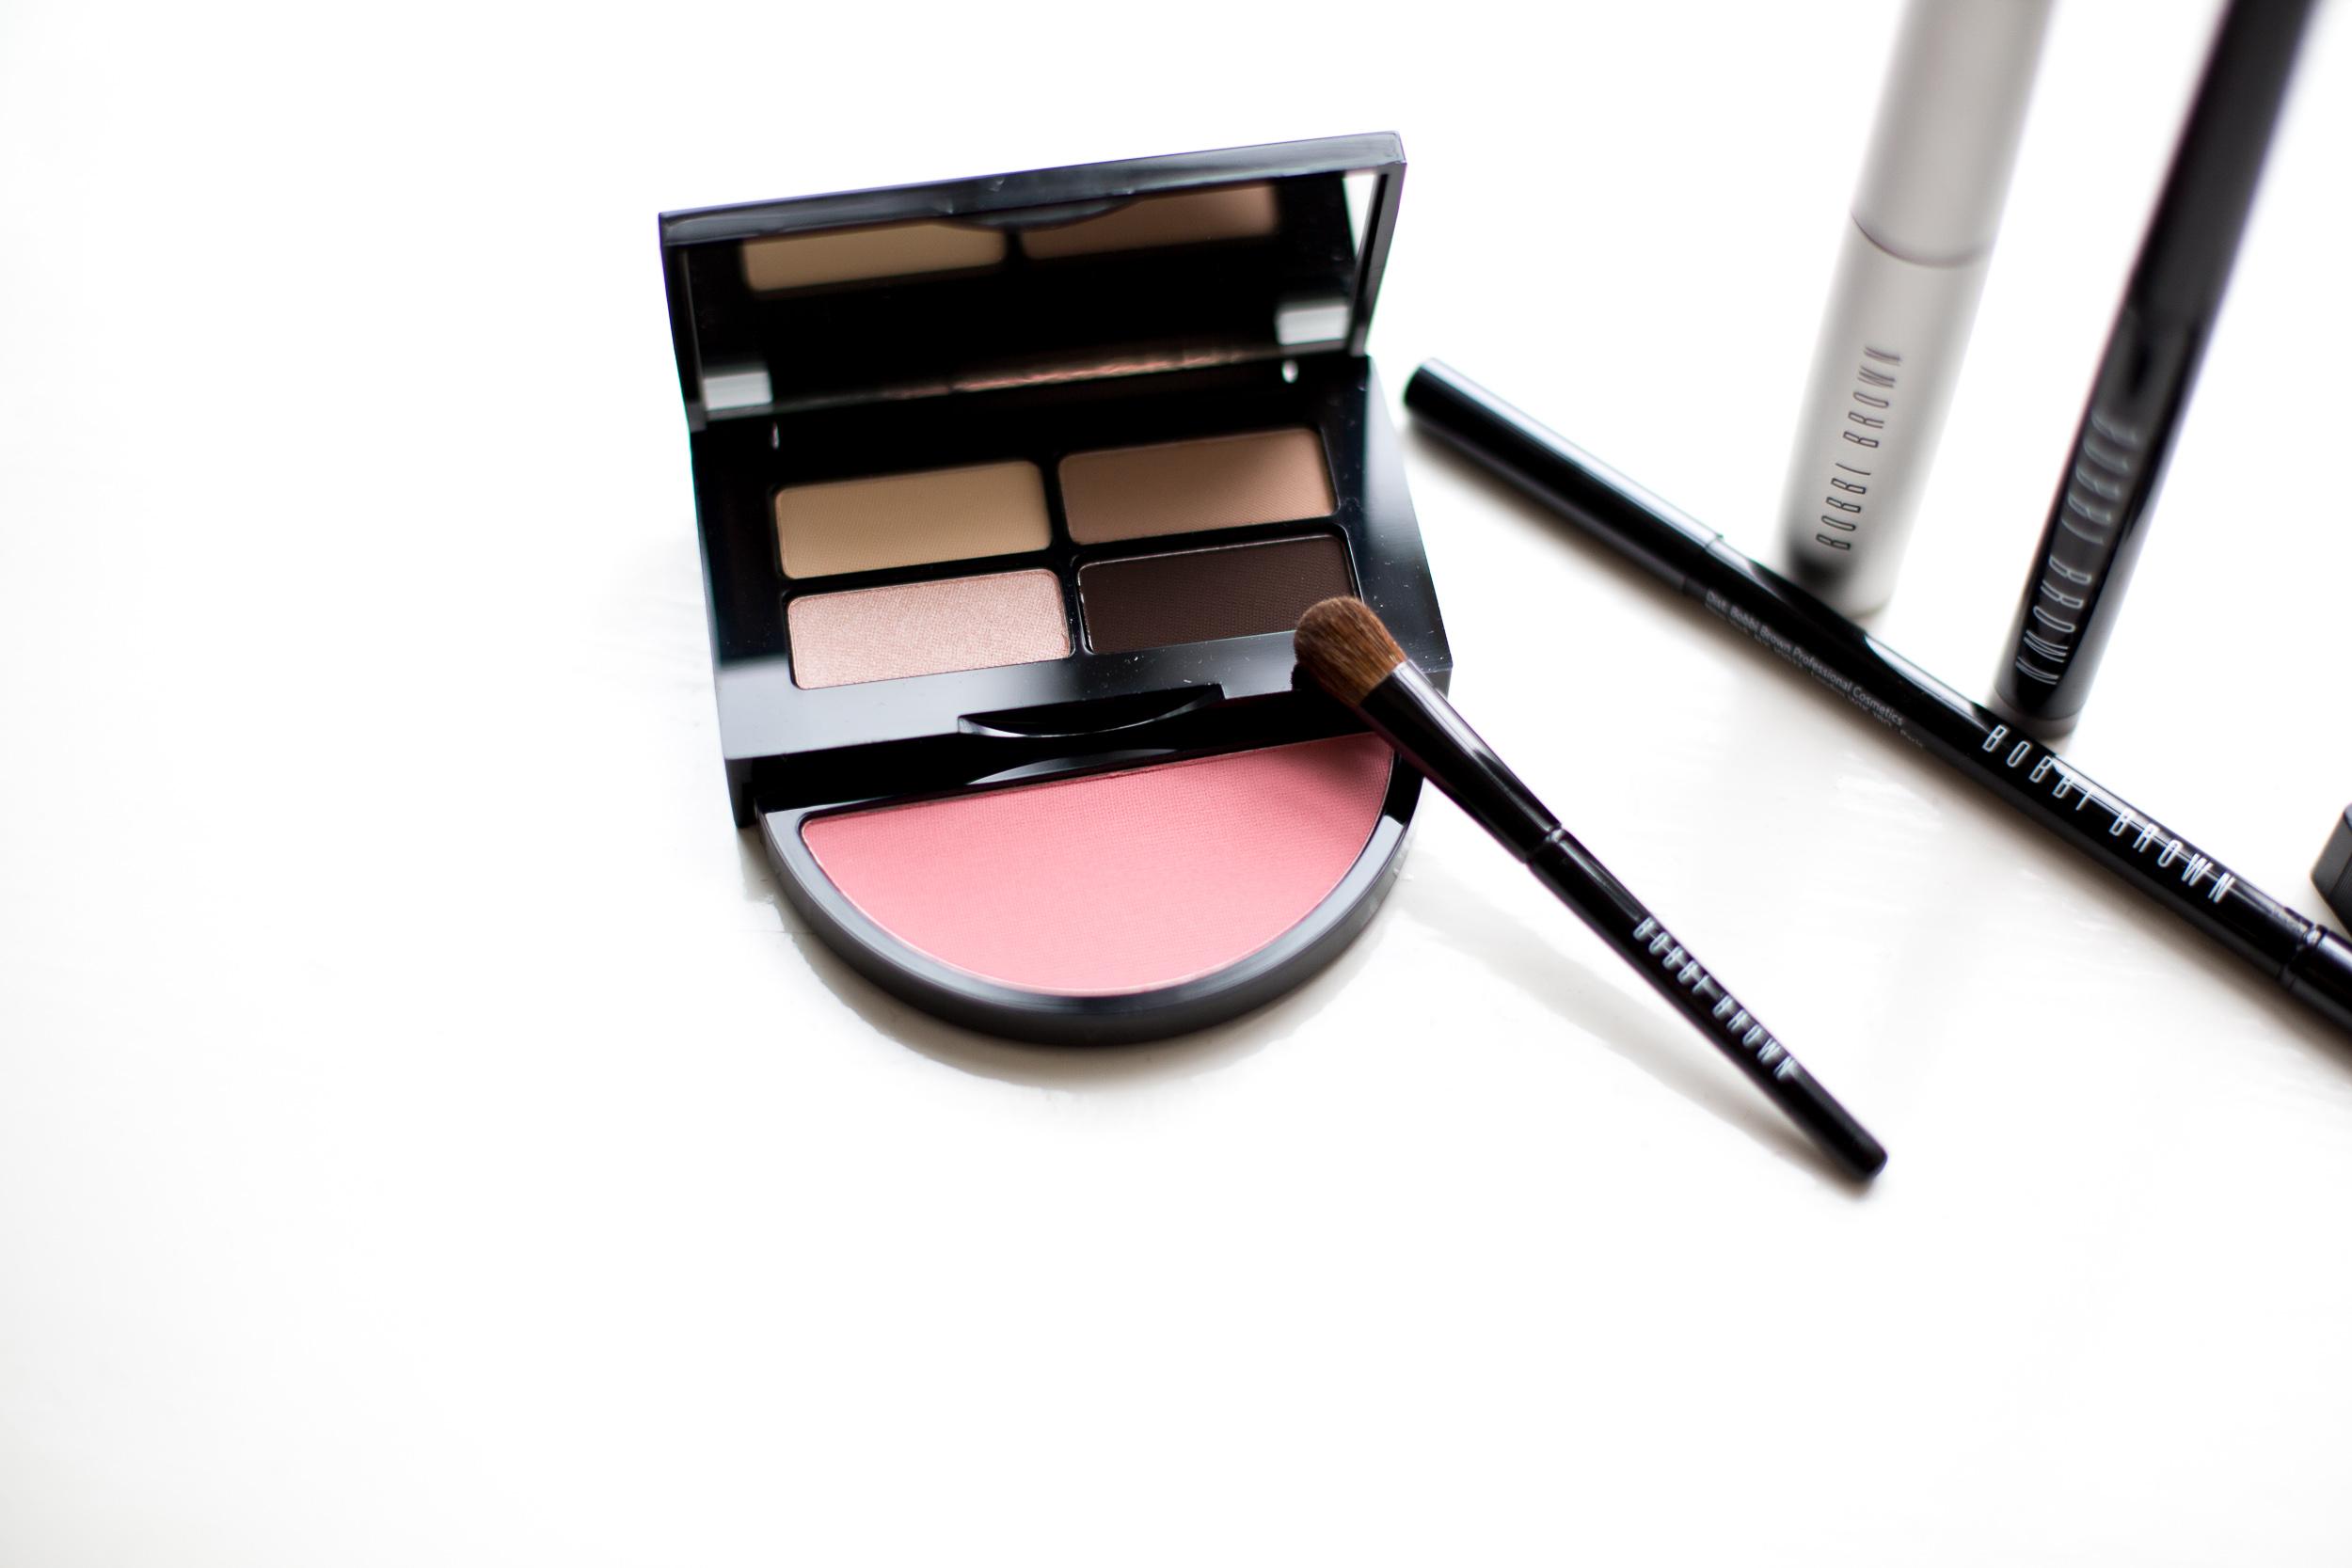 Bobbi Brown Eye Makeup